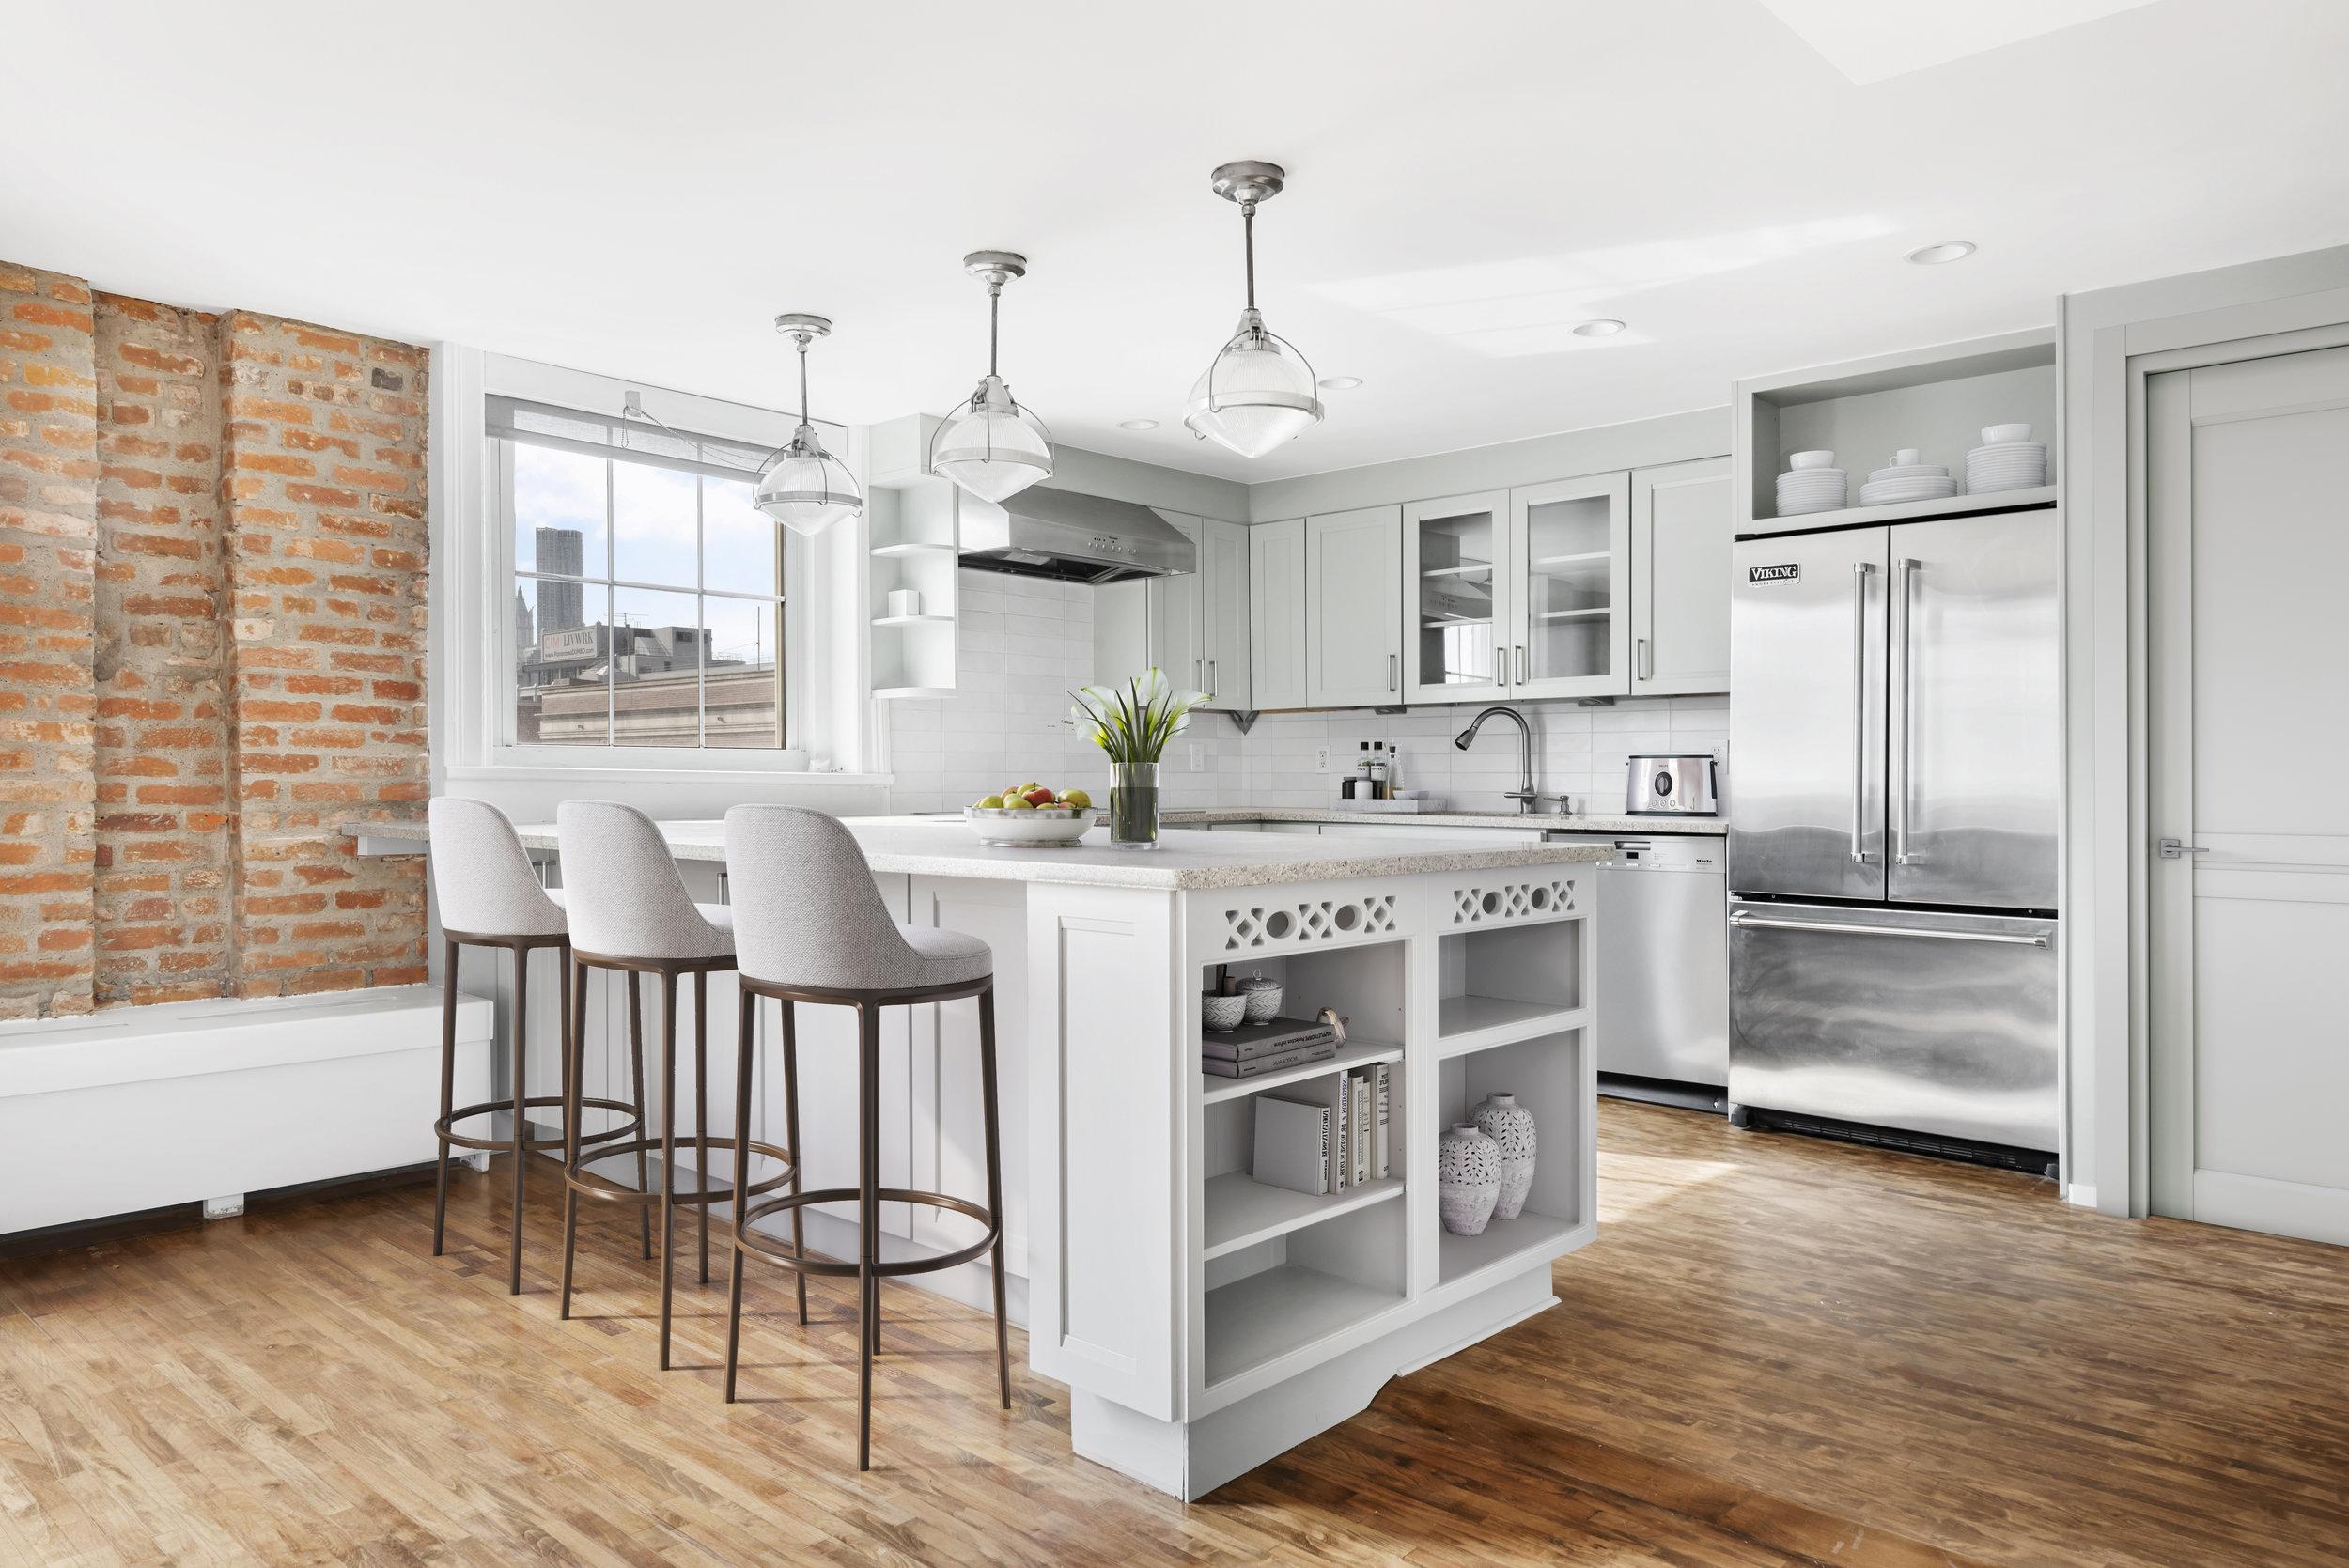 kitchen-1-by-bolster-SMART-renovation.jpg